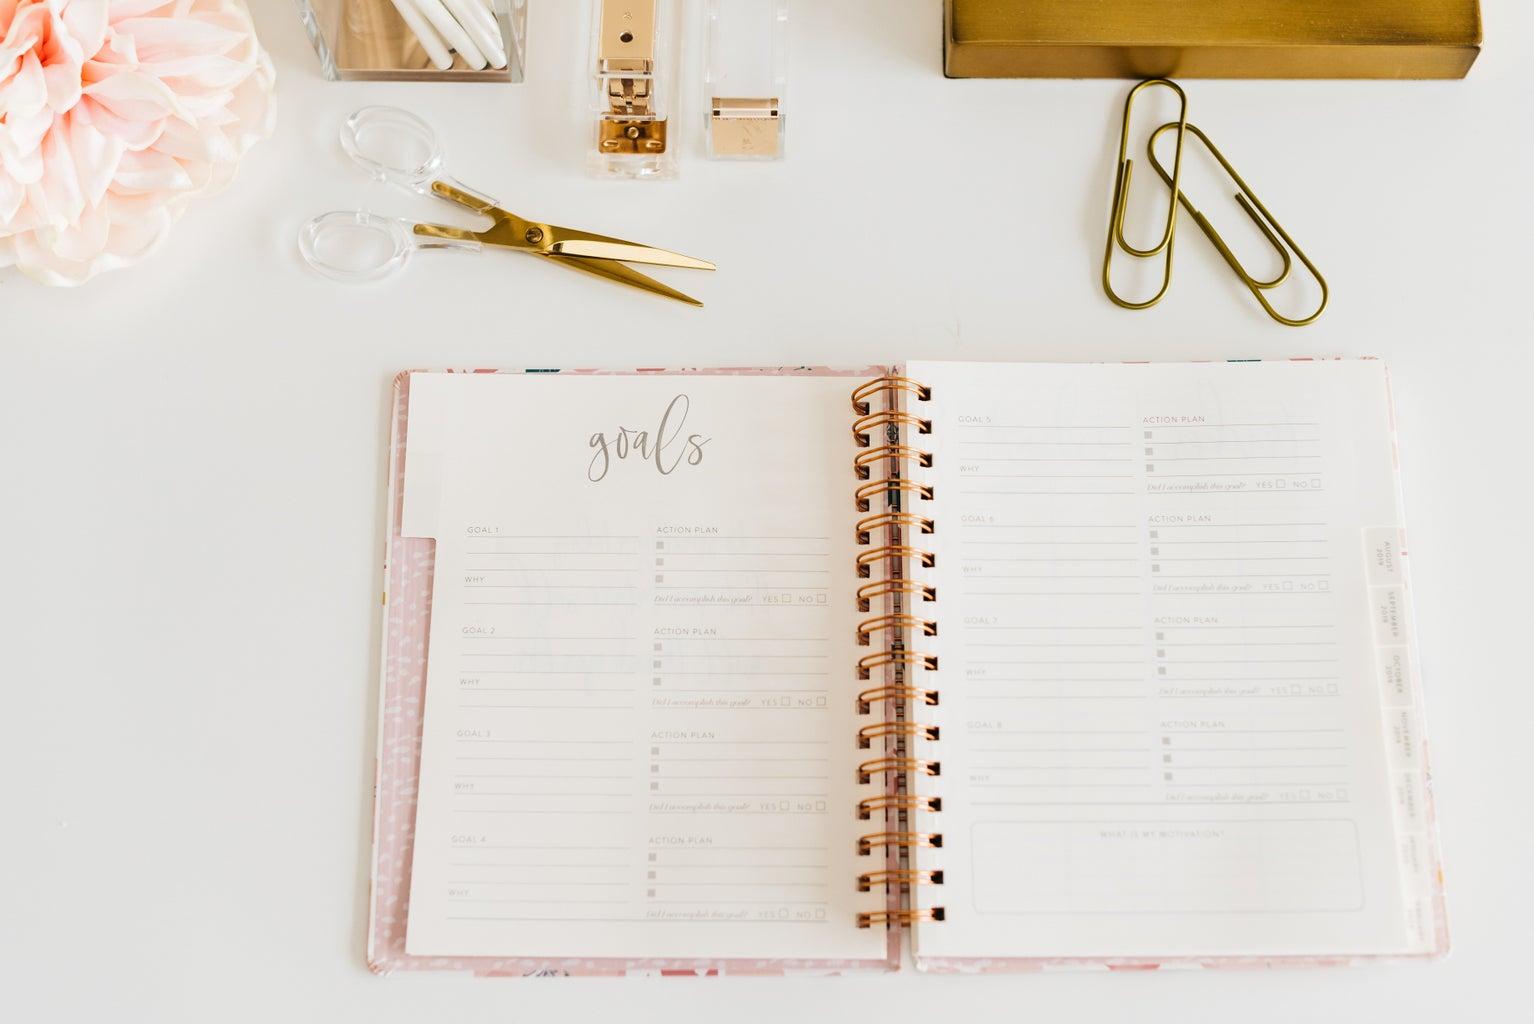 Back-to-school supplies, agenda